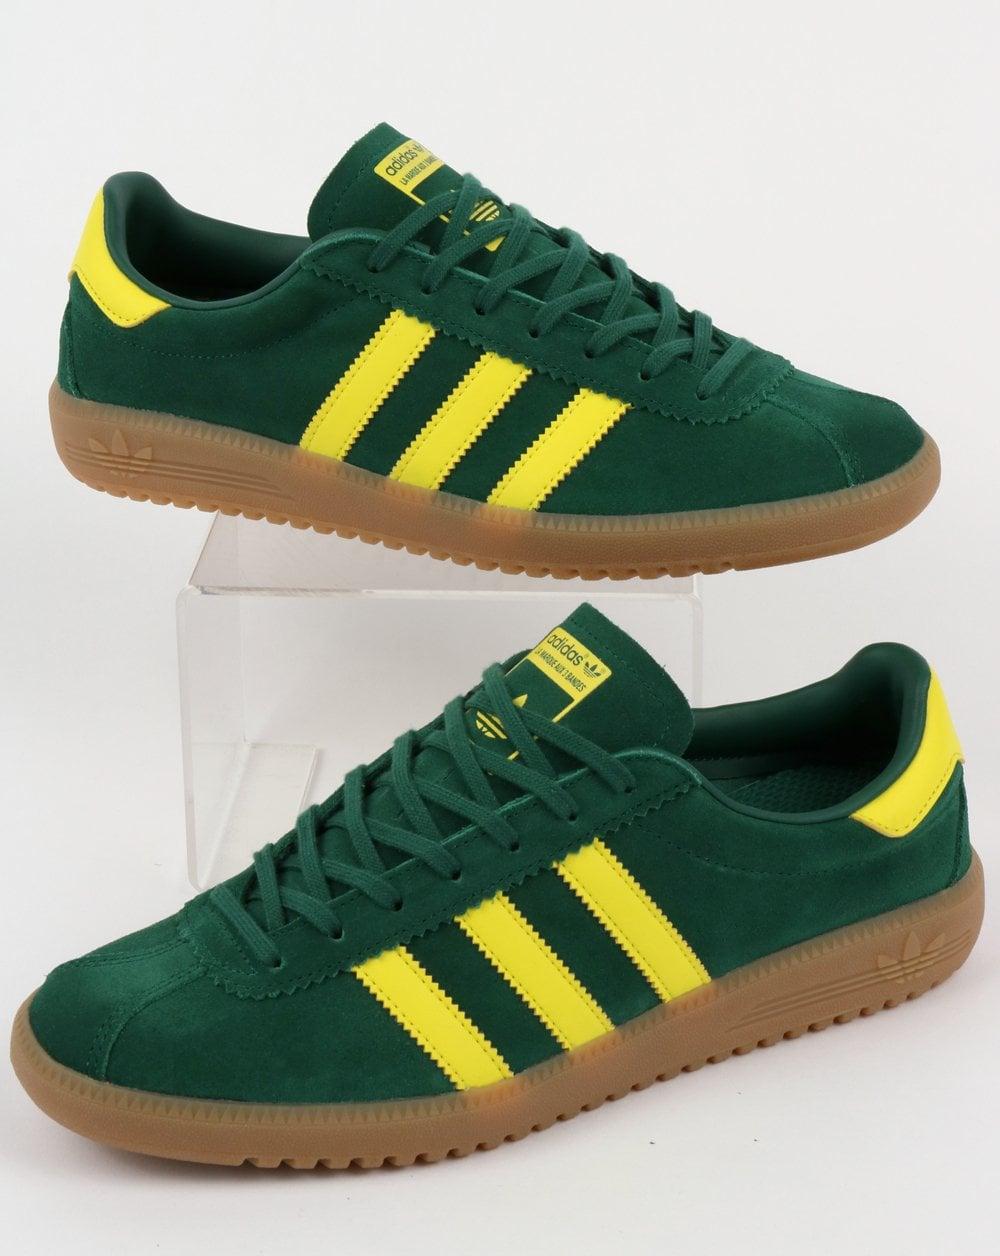 adidas Trainers Adidas Bermuda Trainers Green Yellow 5b5444cf0